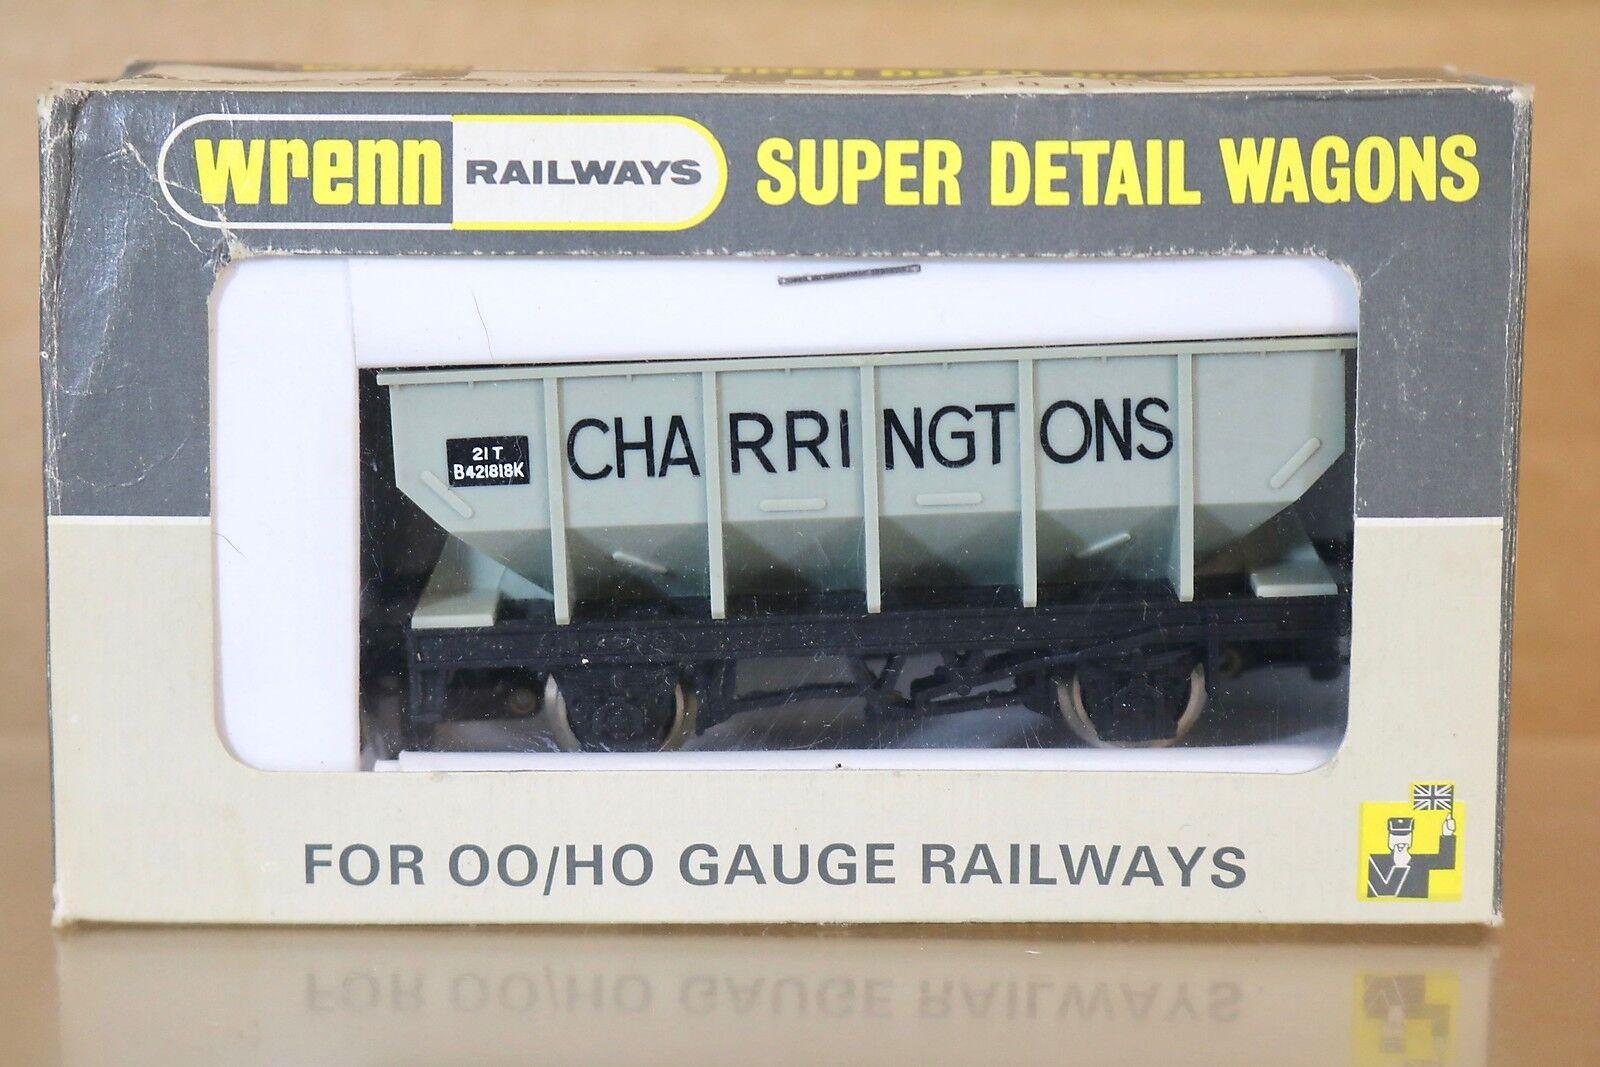 Wrenn W5068 Br grau Charringtons Tramoggia Vagone B421818K Mint Inscatolato Np